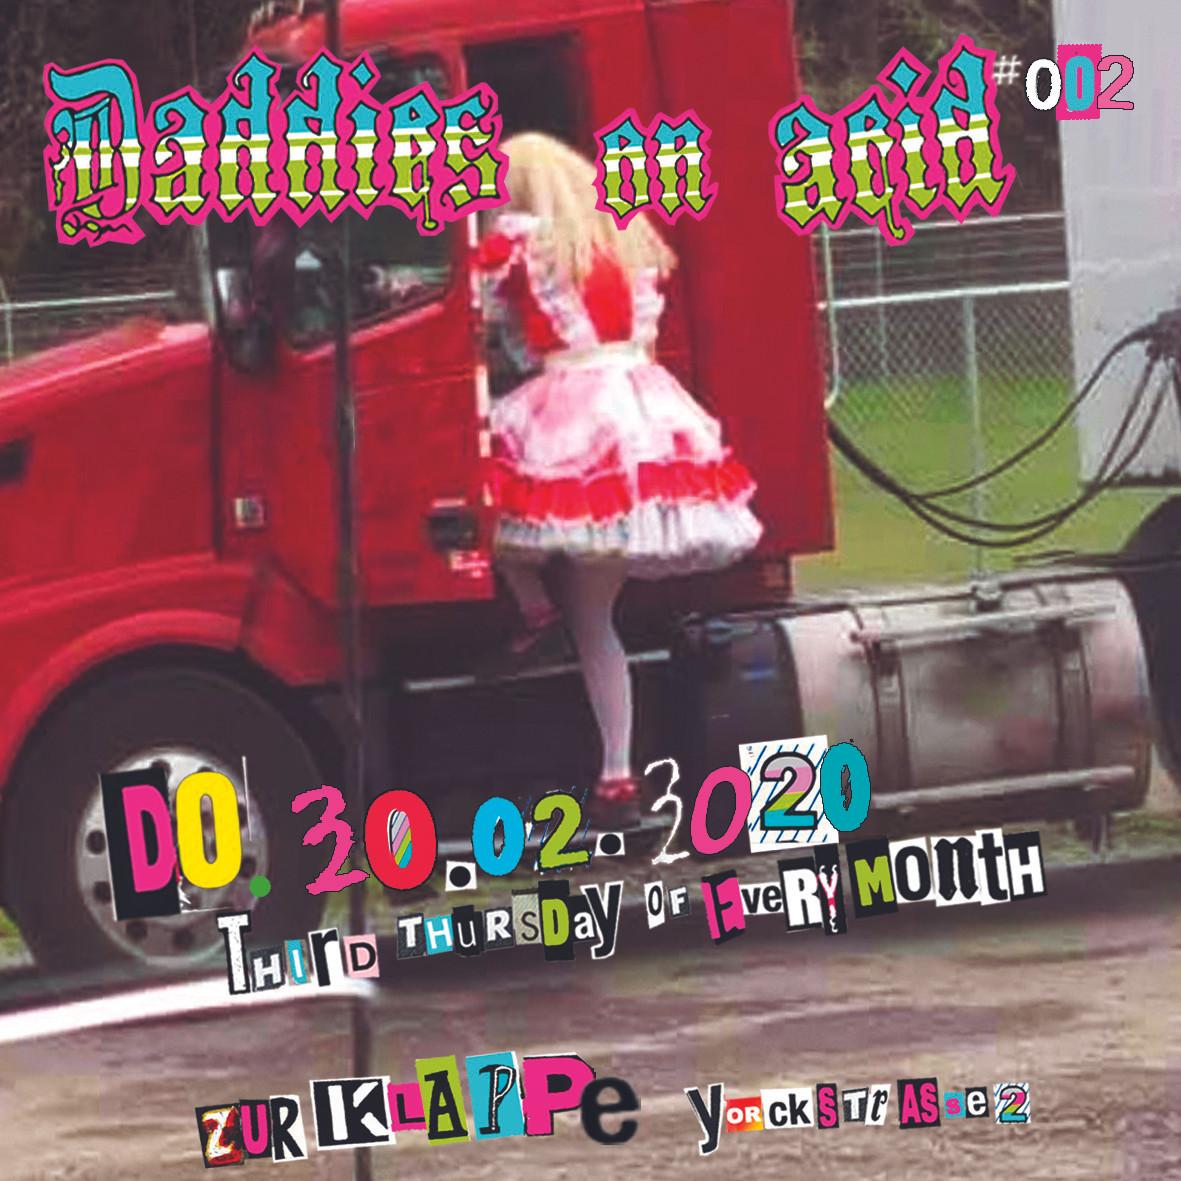 daddies_002_BMD_DonA_postcard_FRONT .jpg